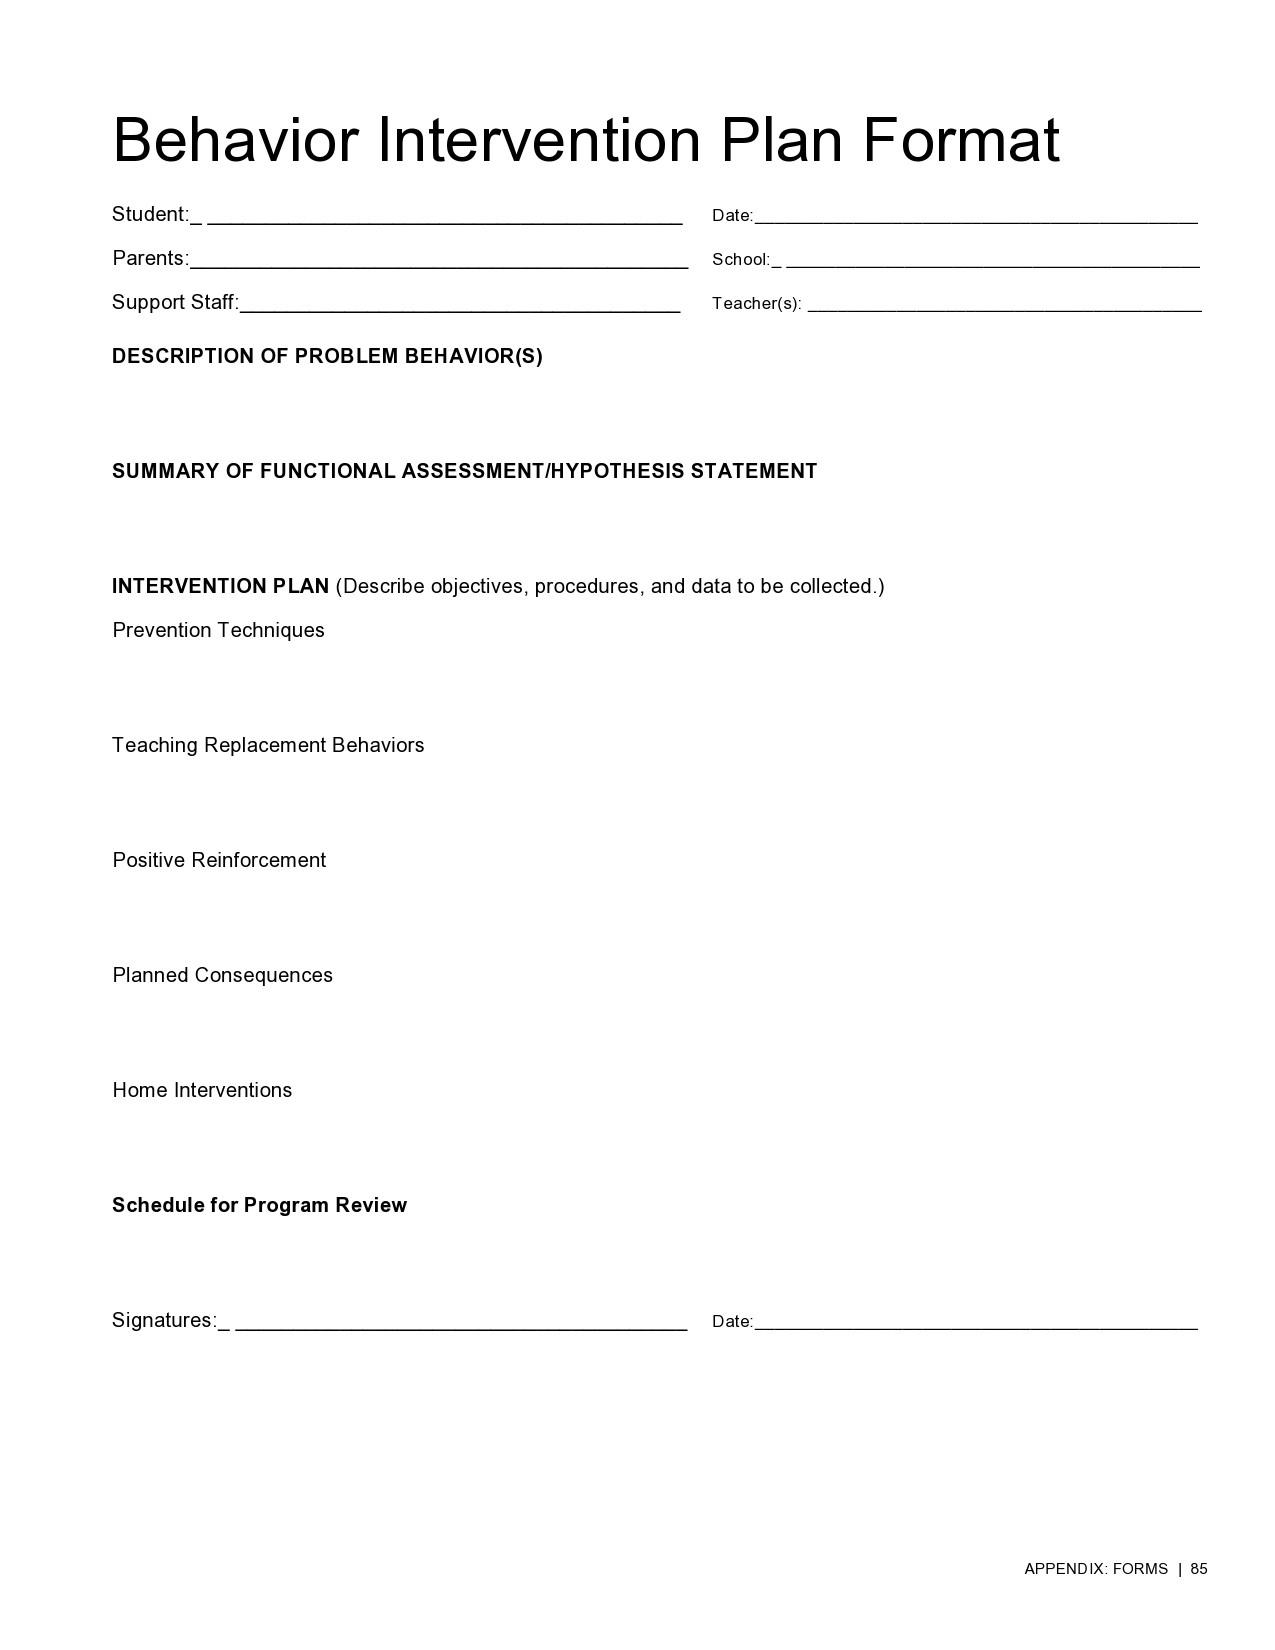 Free behavior plan template 32